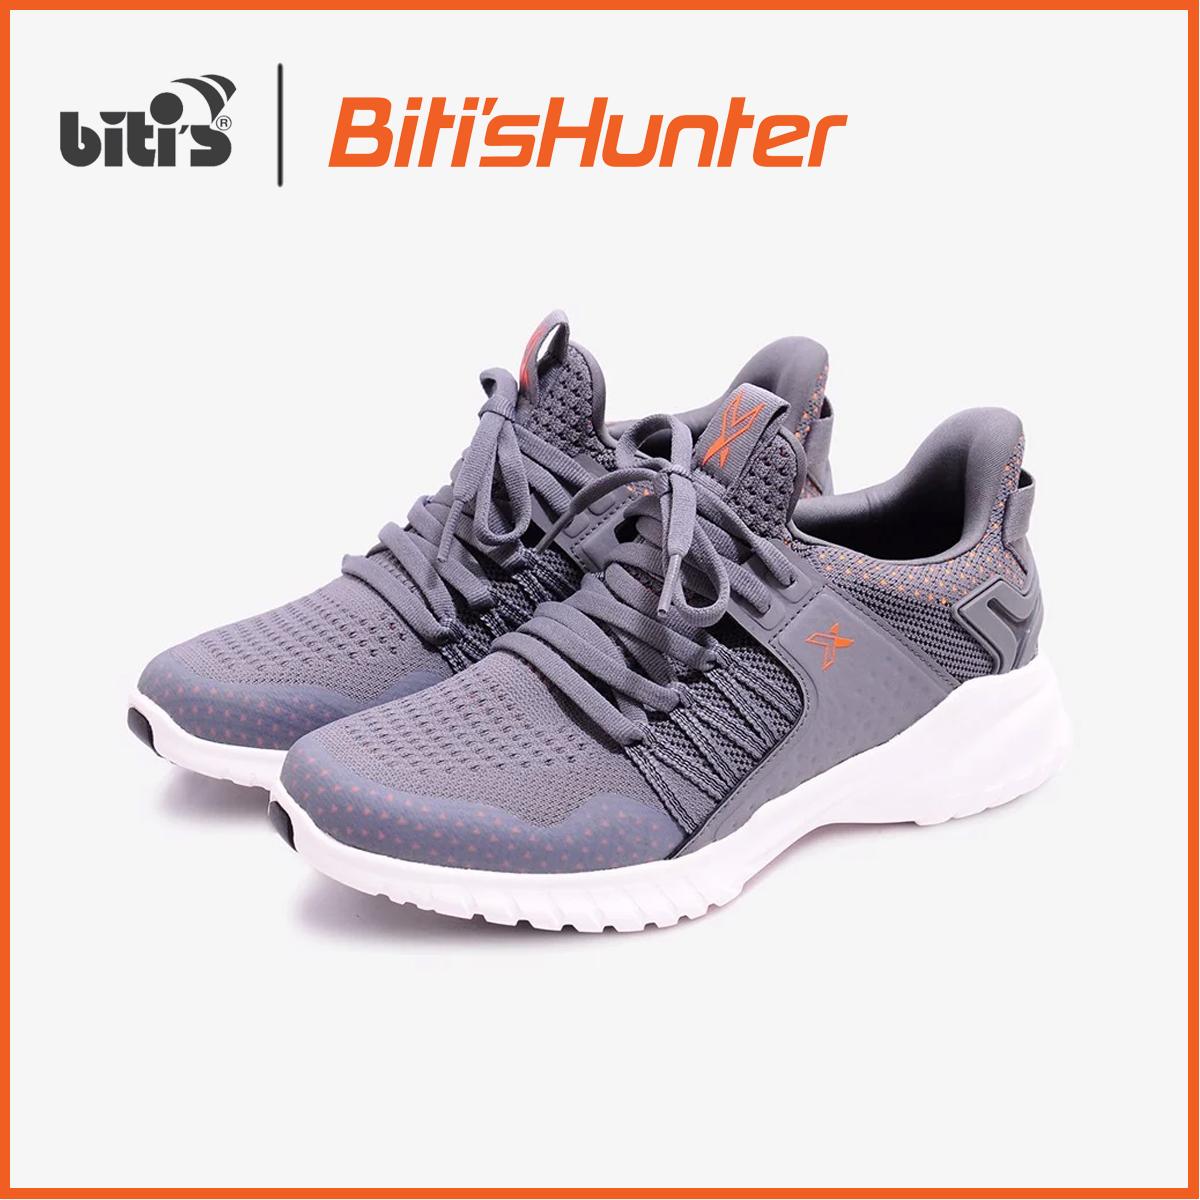 Giày Thể Thao Cao Cấp Nam Biti's Hunter X - Summer 2K19 ADVENTURE COLLECTION - Dusk Grey DSMH01100XAM